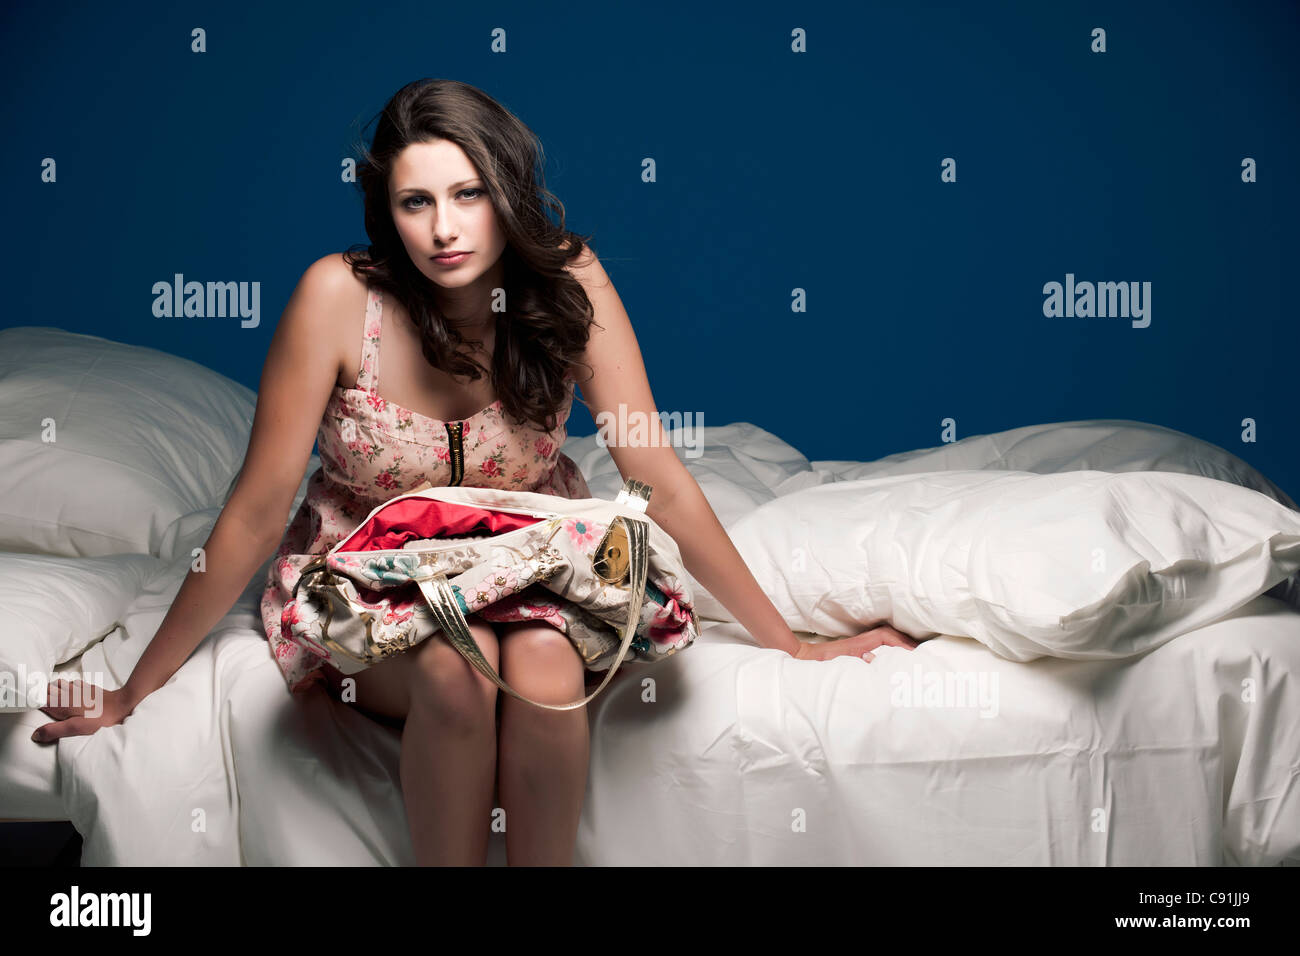 Teenage girl holding purse on bed - Stock Image